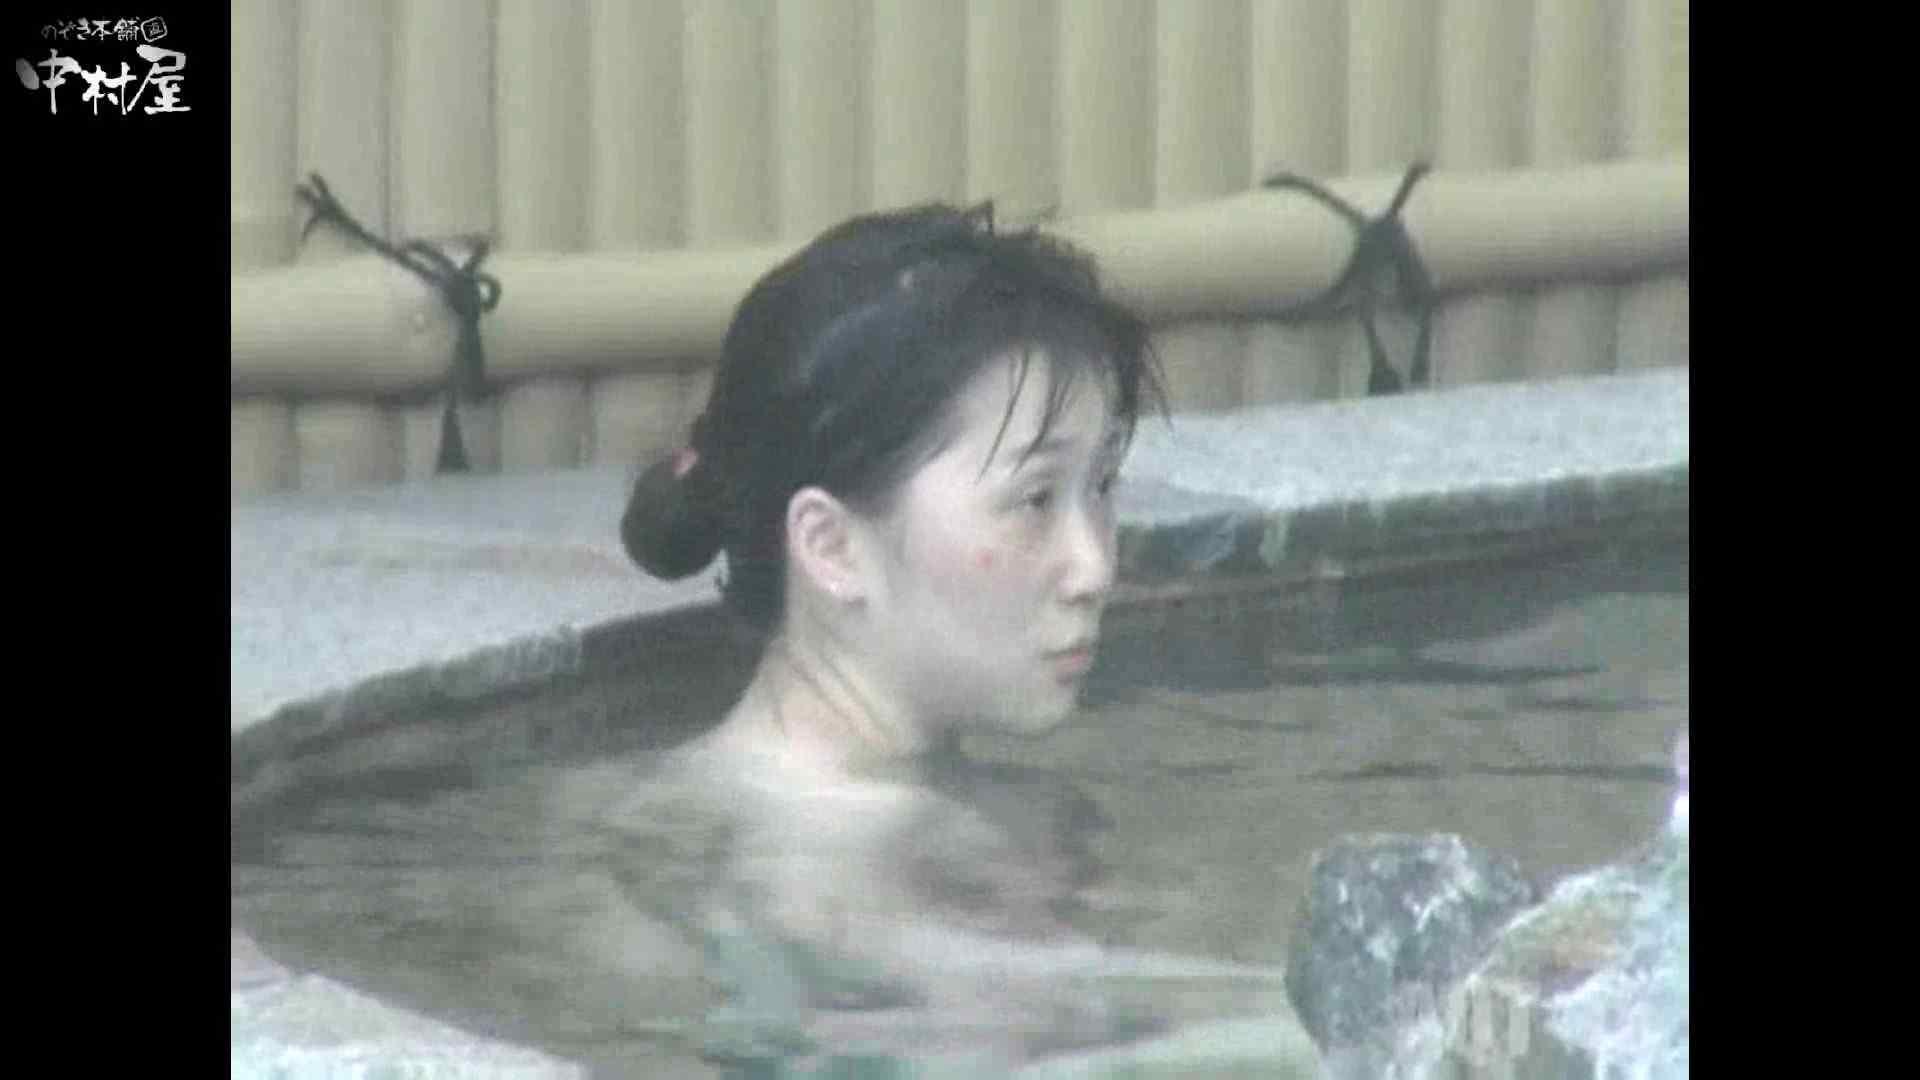 Aquaな露天風呂Vol.878潜入盗撮露天風呂十五判湯 其の一 潜入   0  56連発 36